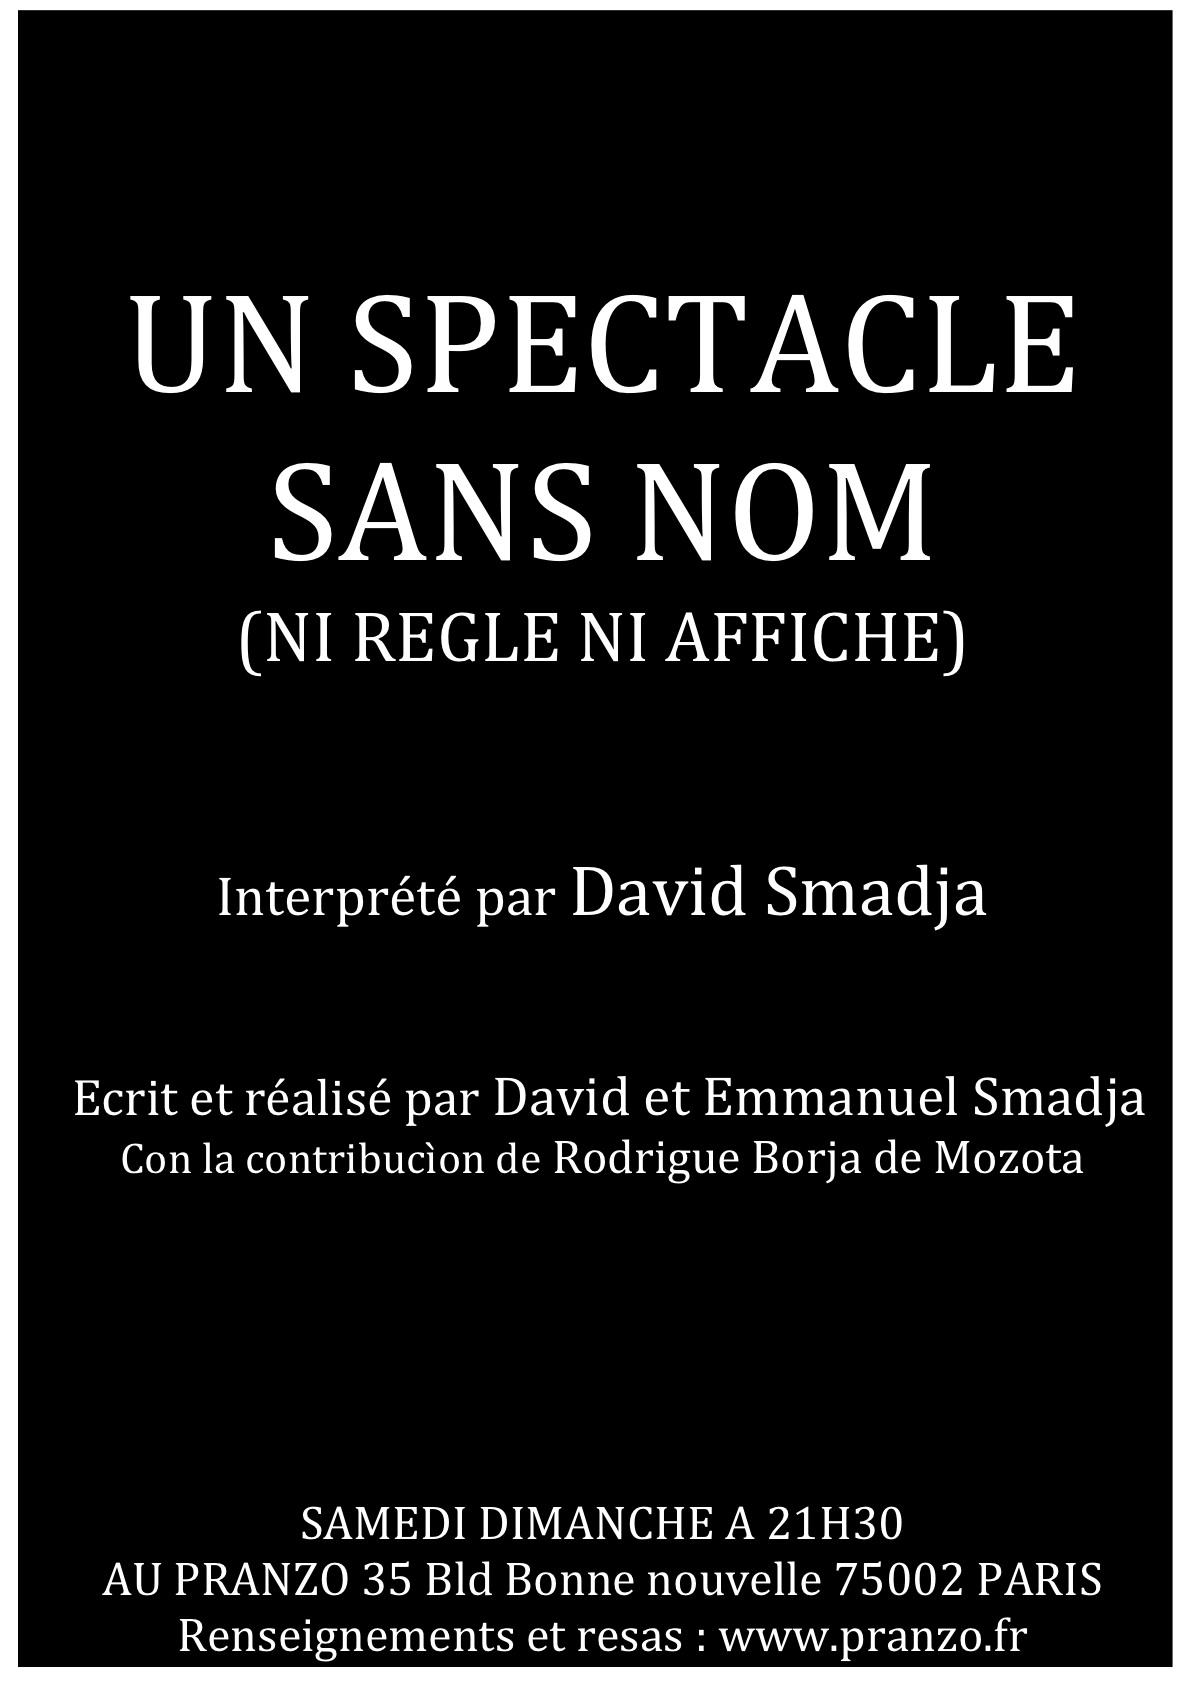 soiree-paris-20110107-david